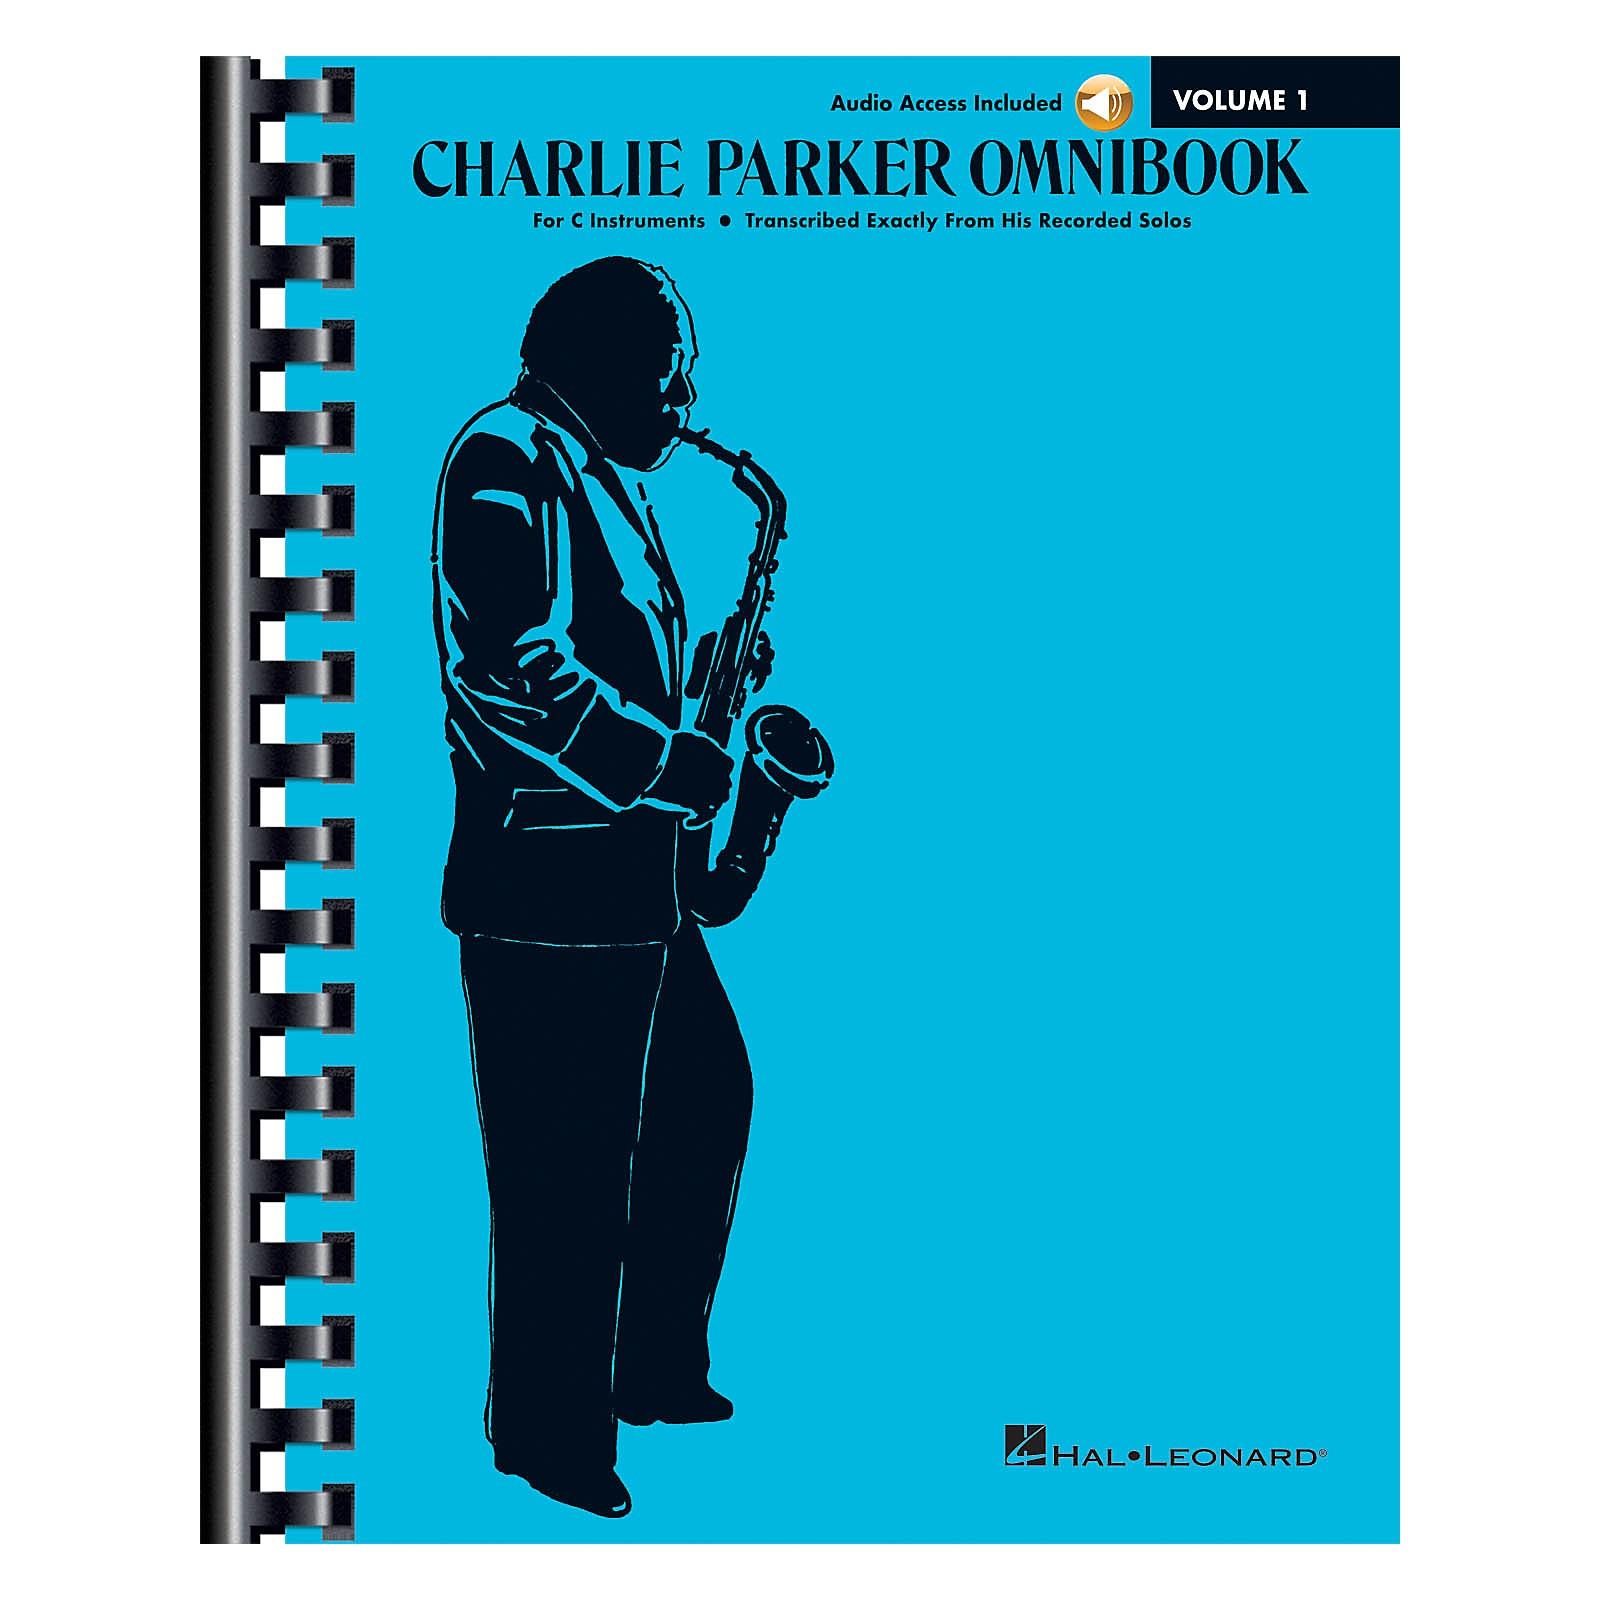 Hal Leonard Charlie Parker Omnibook - Volume 1 C Instruments Edition Book/Online Audio